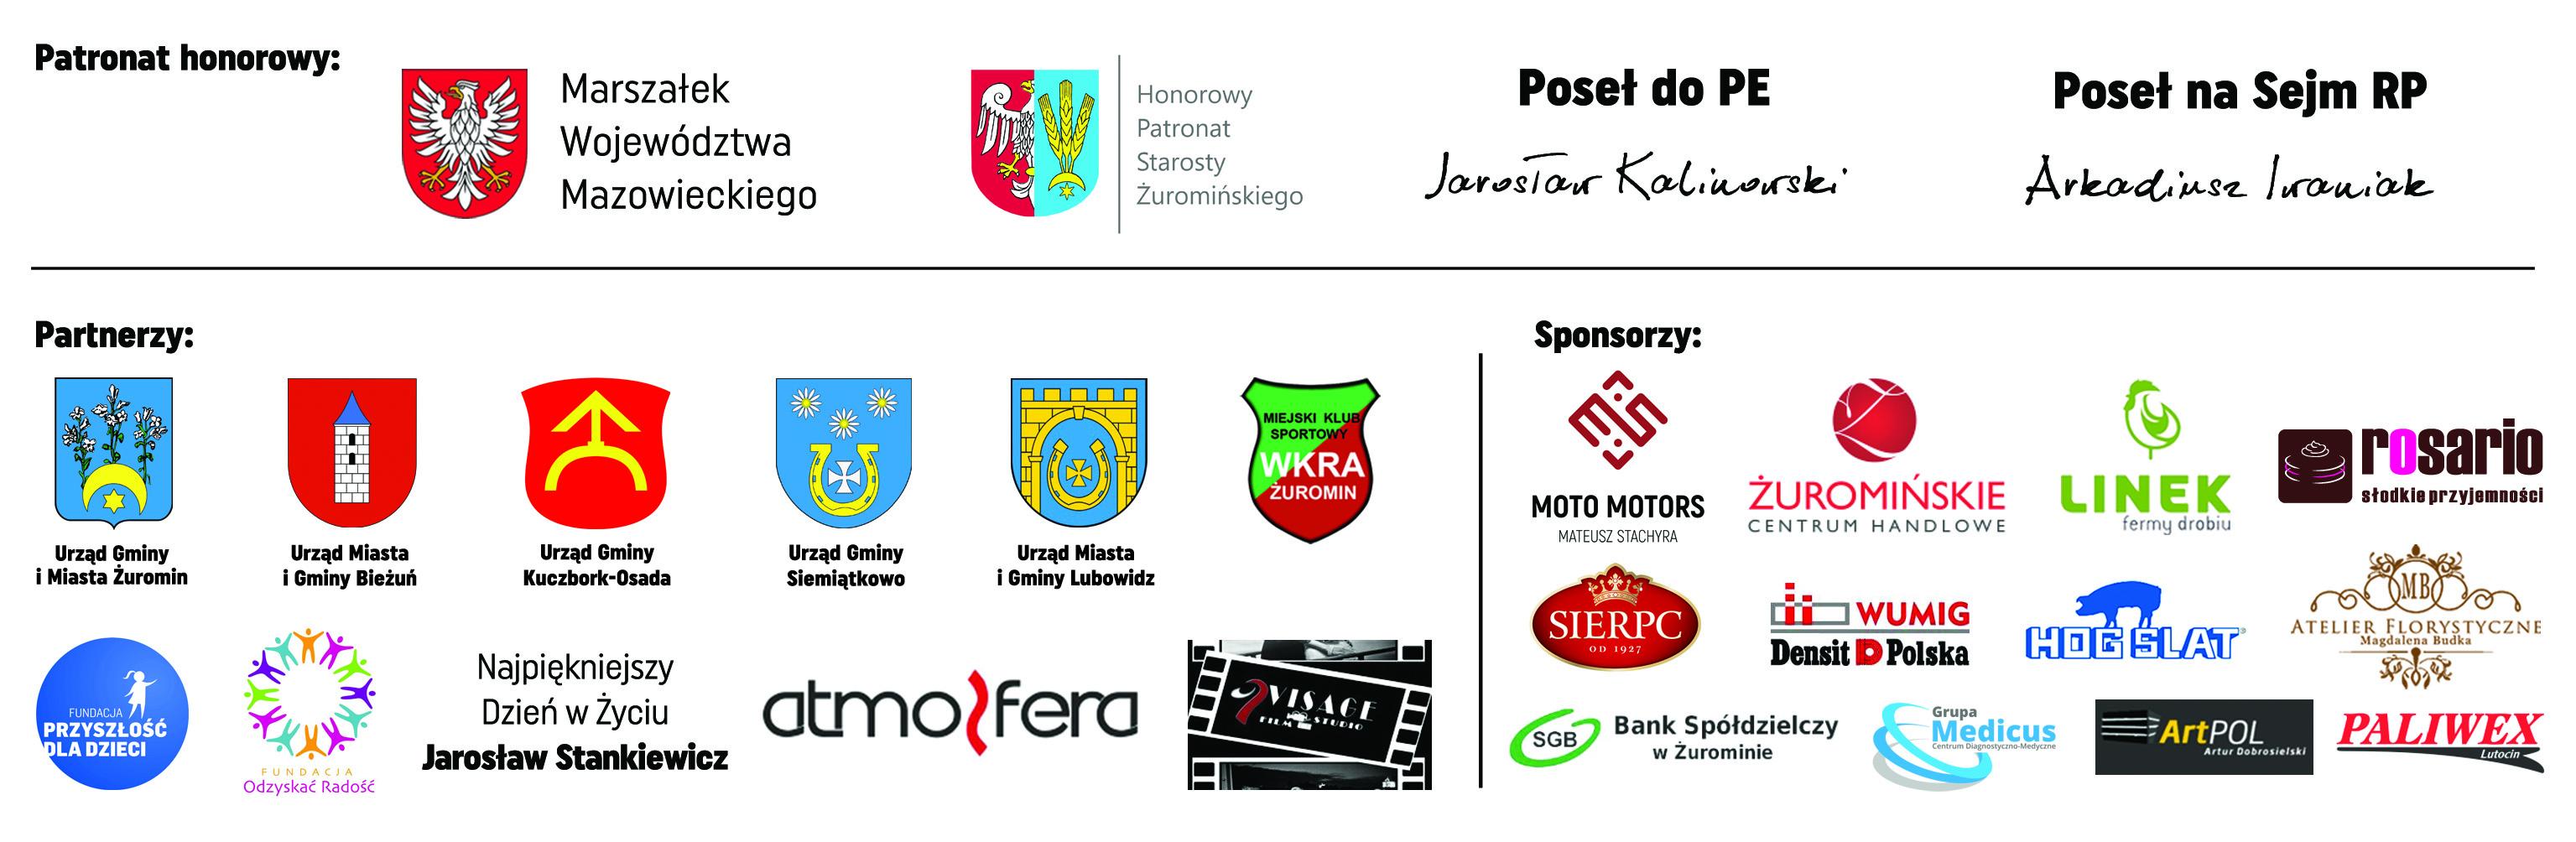 http://m.wm.pl/2020/02/orig/sponsorzy-belka-260x85-608189.jpg